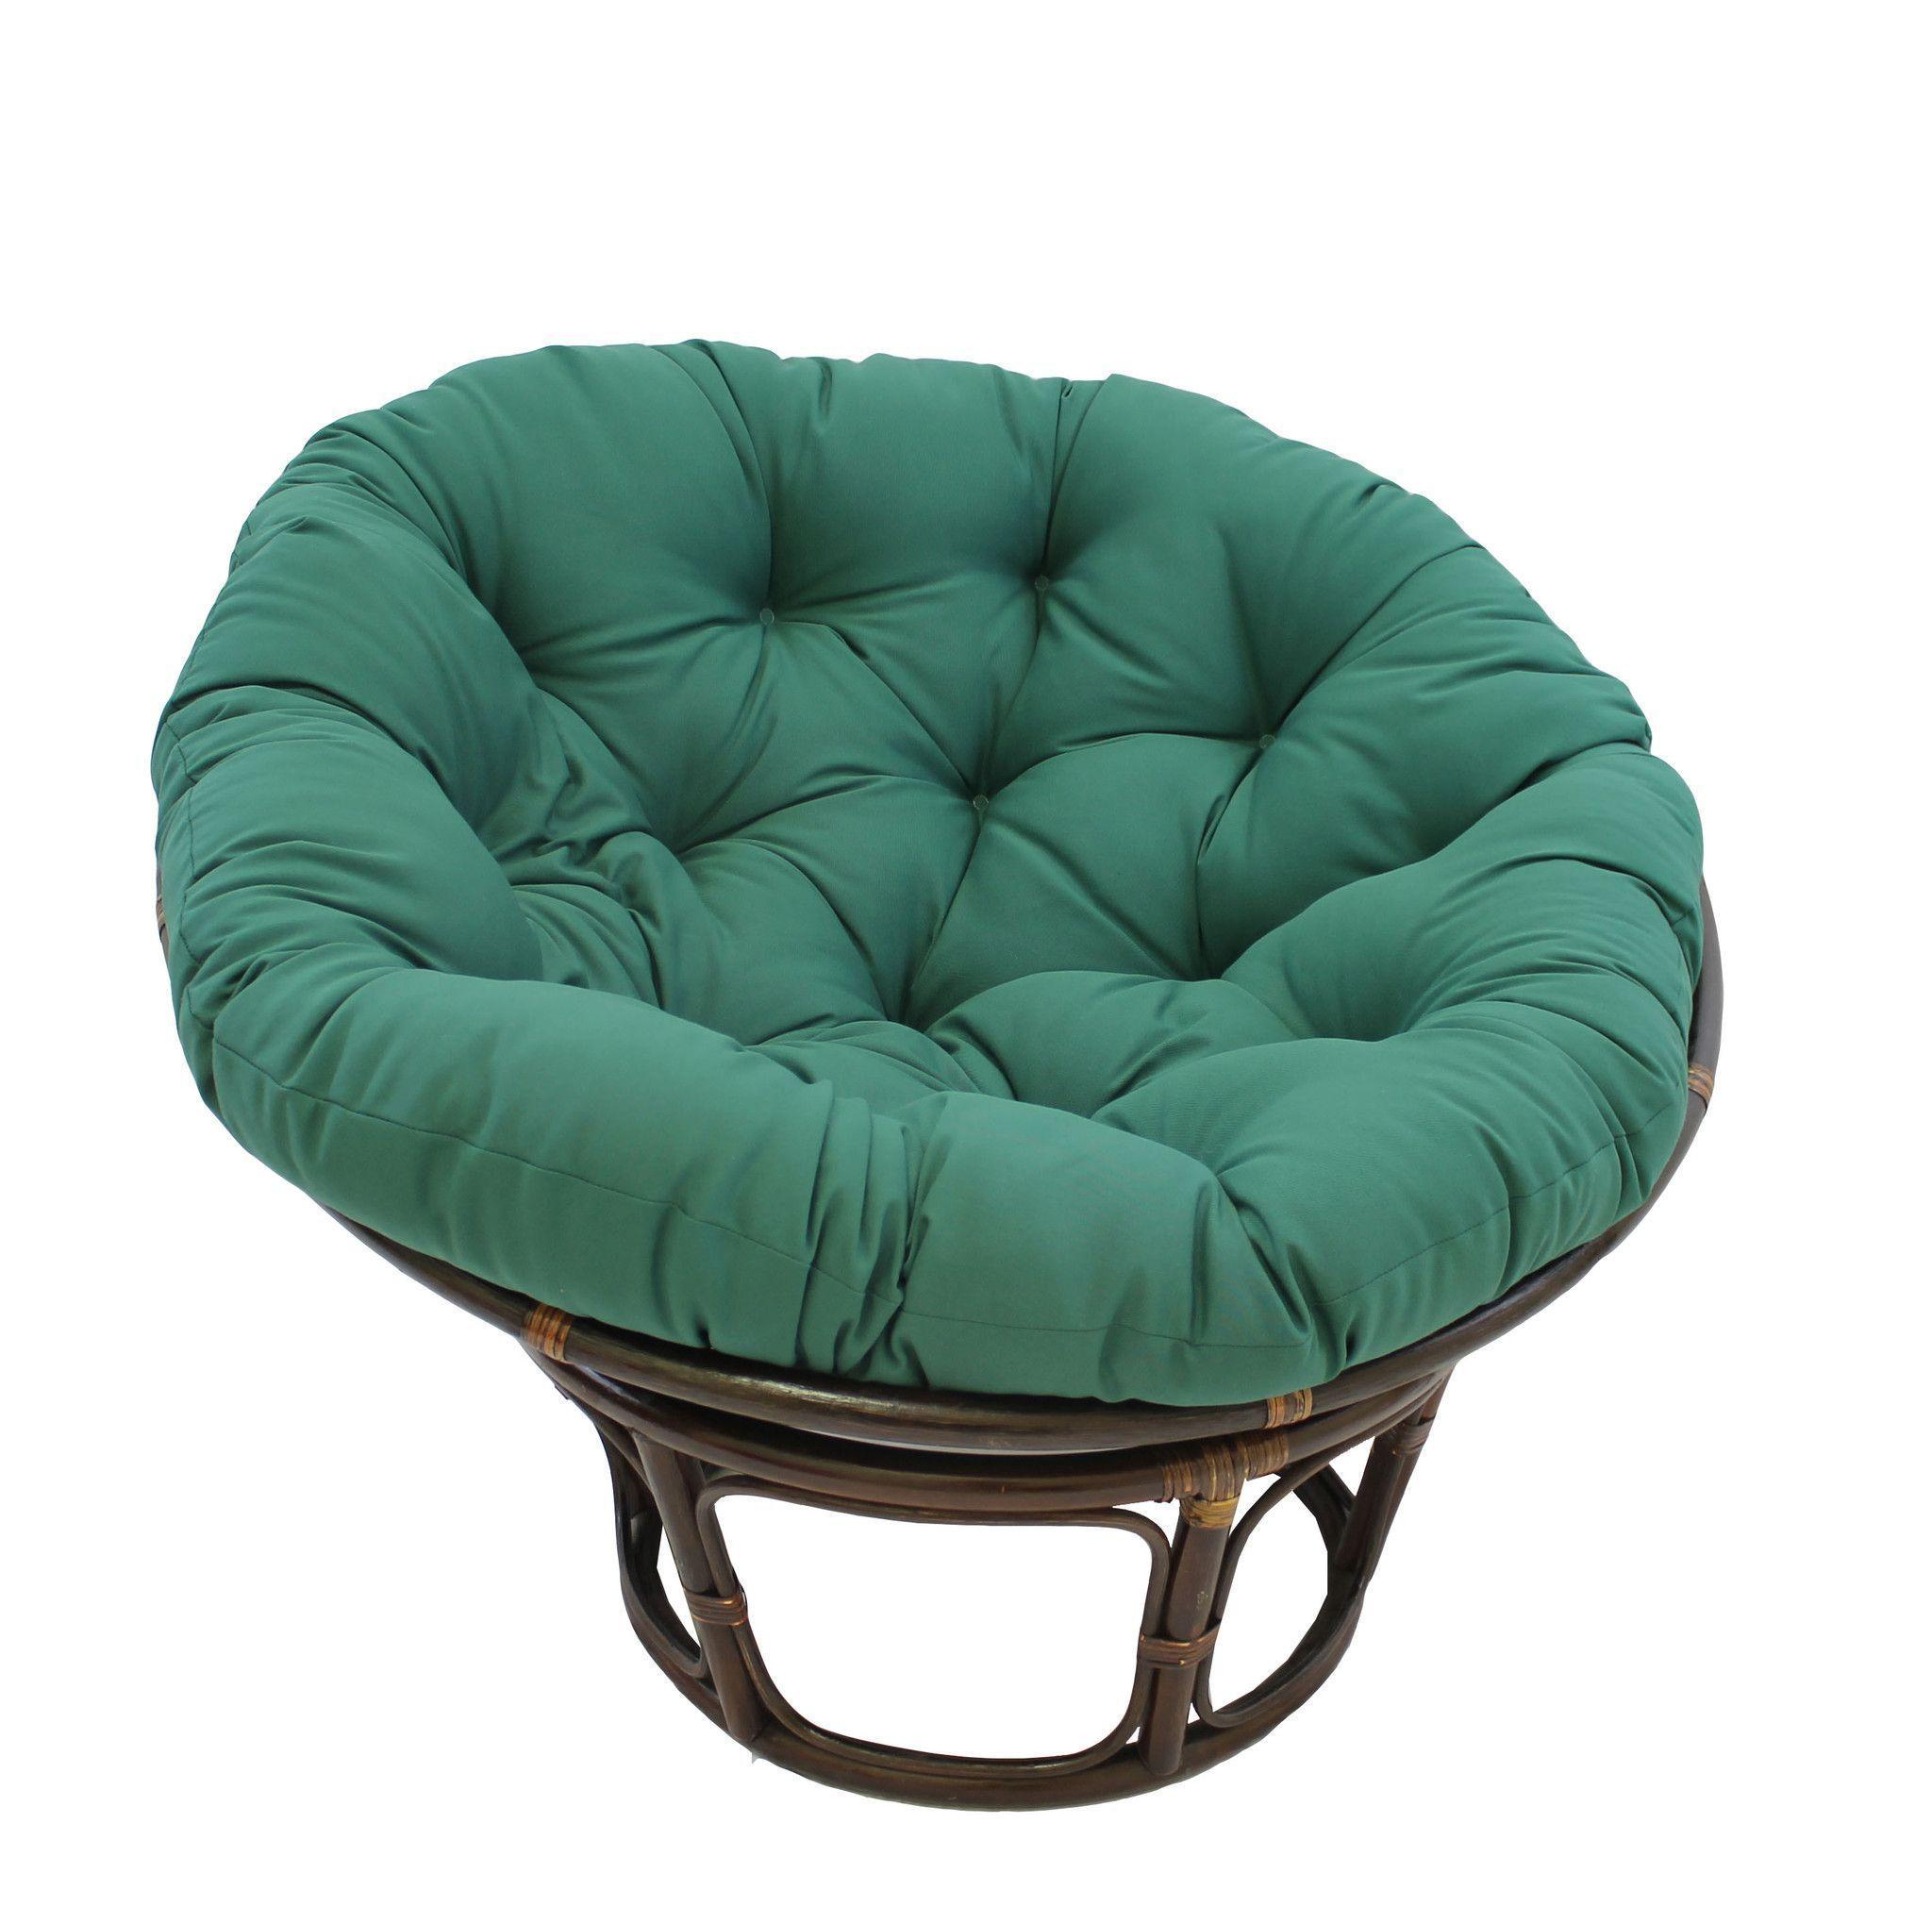 International caravan 42inch rattan papasan chair with